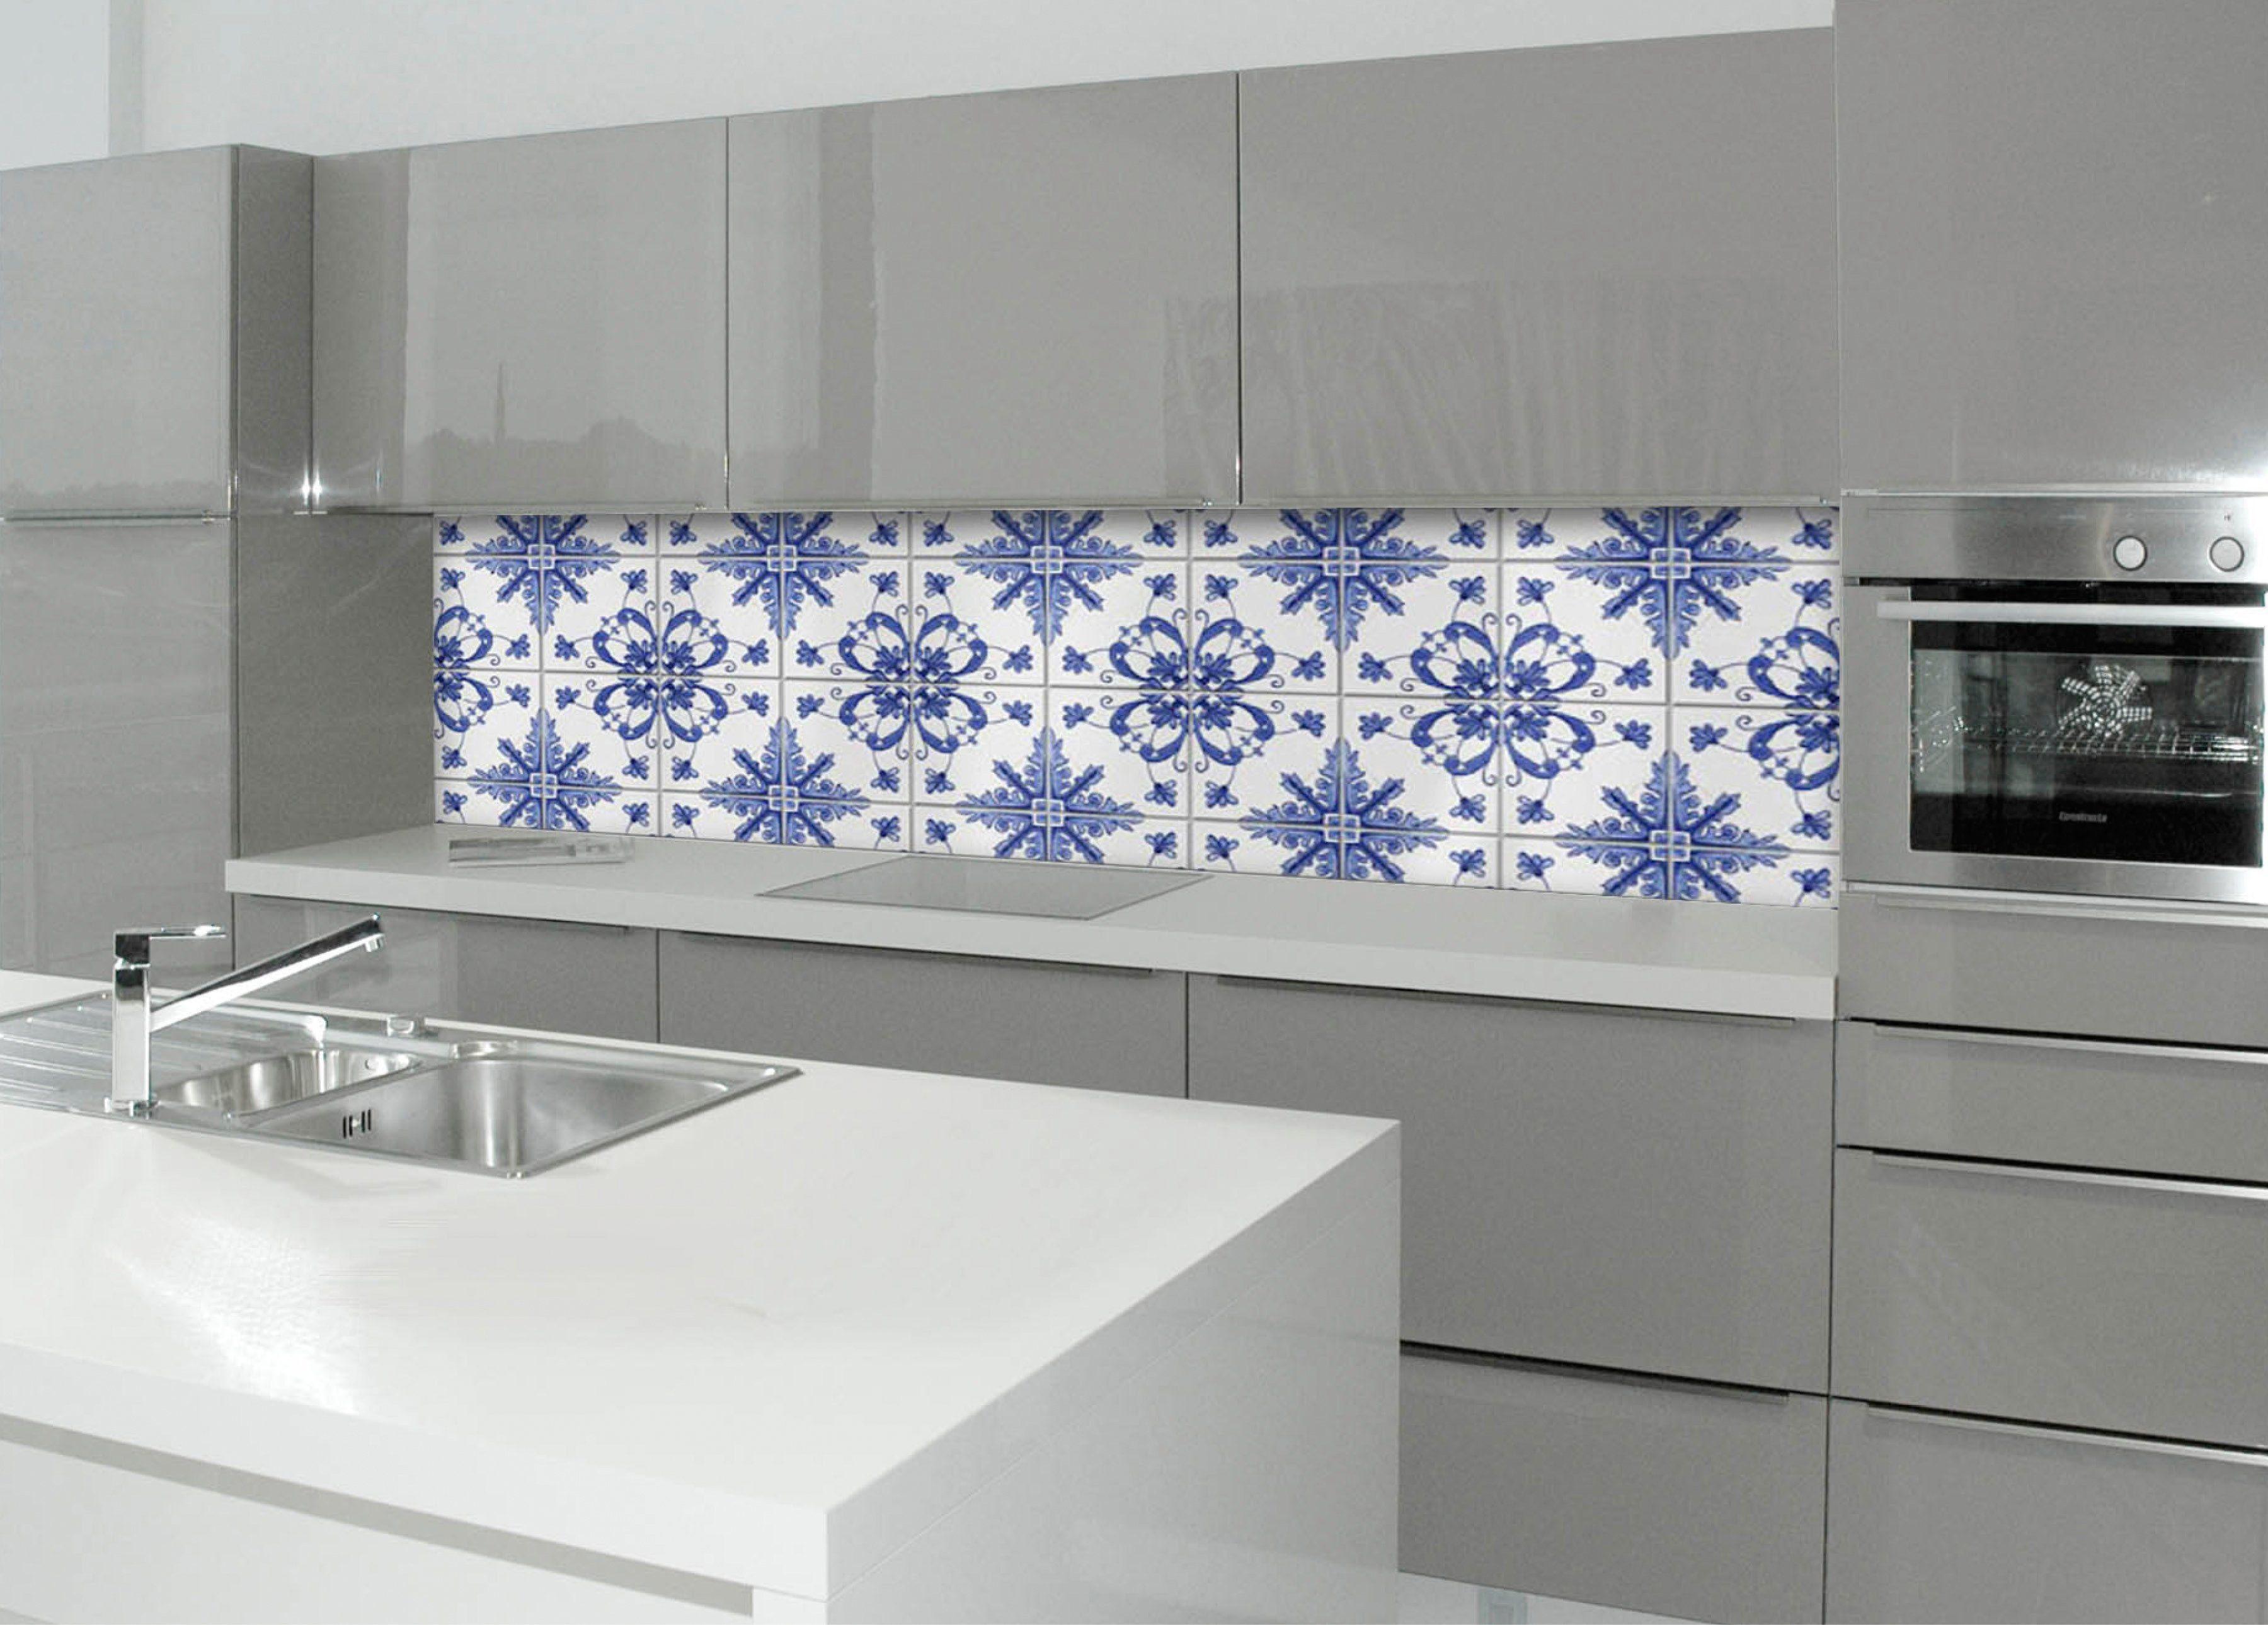 Küchenrückwand - Spritzschutz »profix«, Delfter Fliese, 220x60 cm